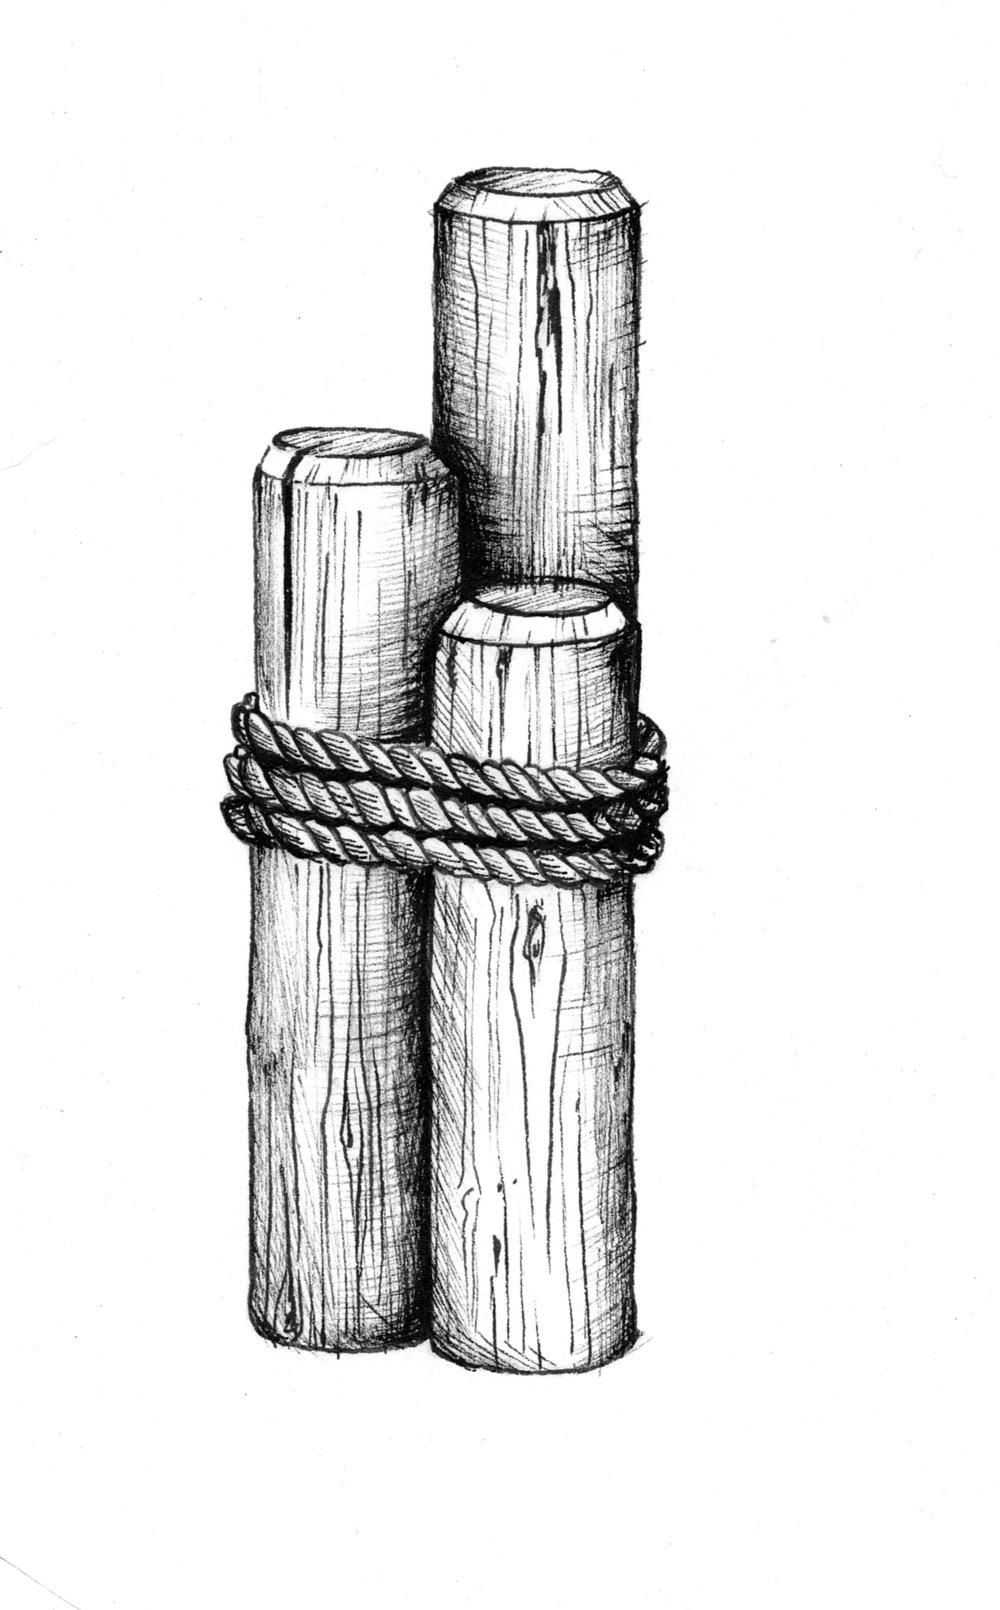 ordinary pier piling #2: Pier Pilings